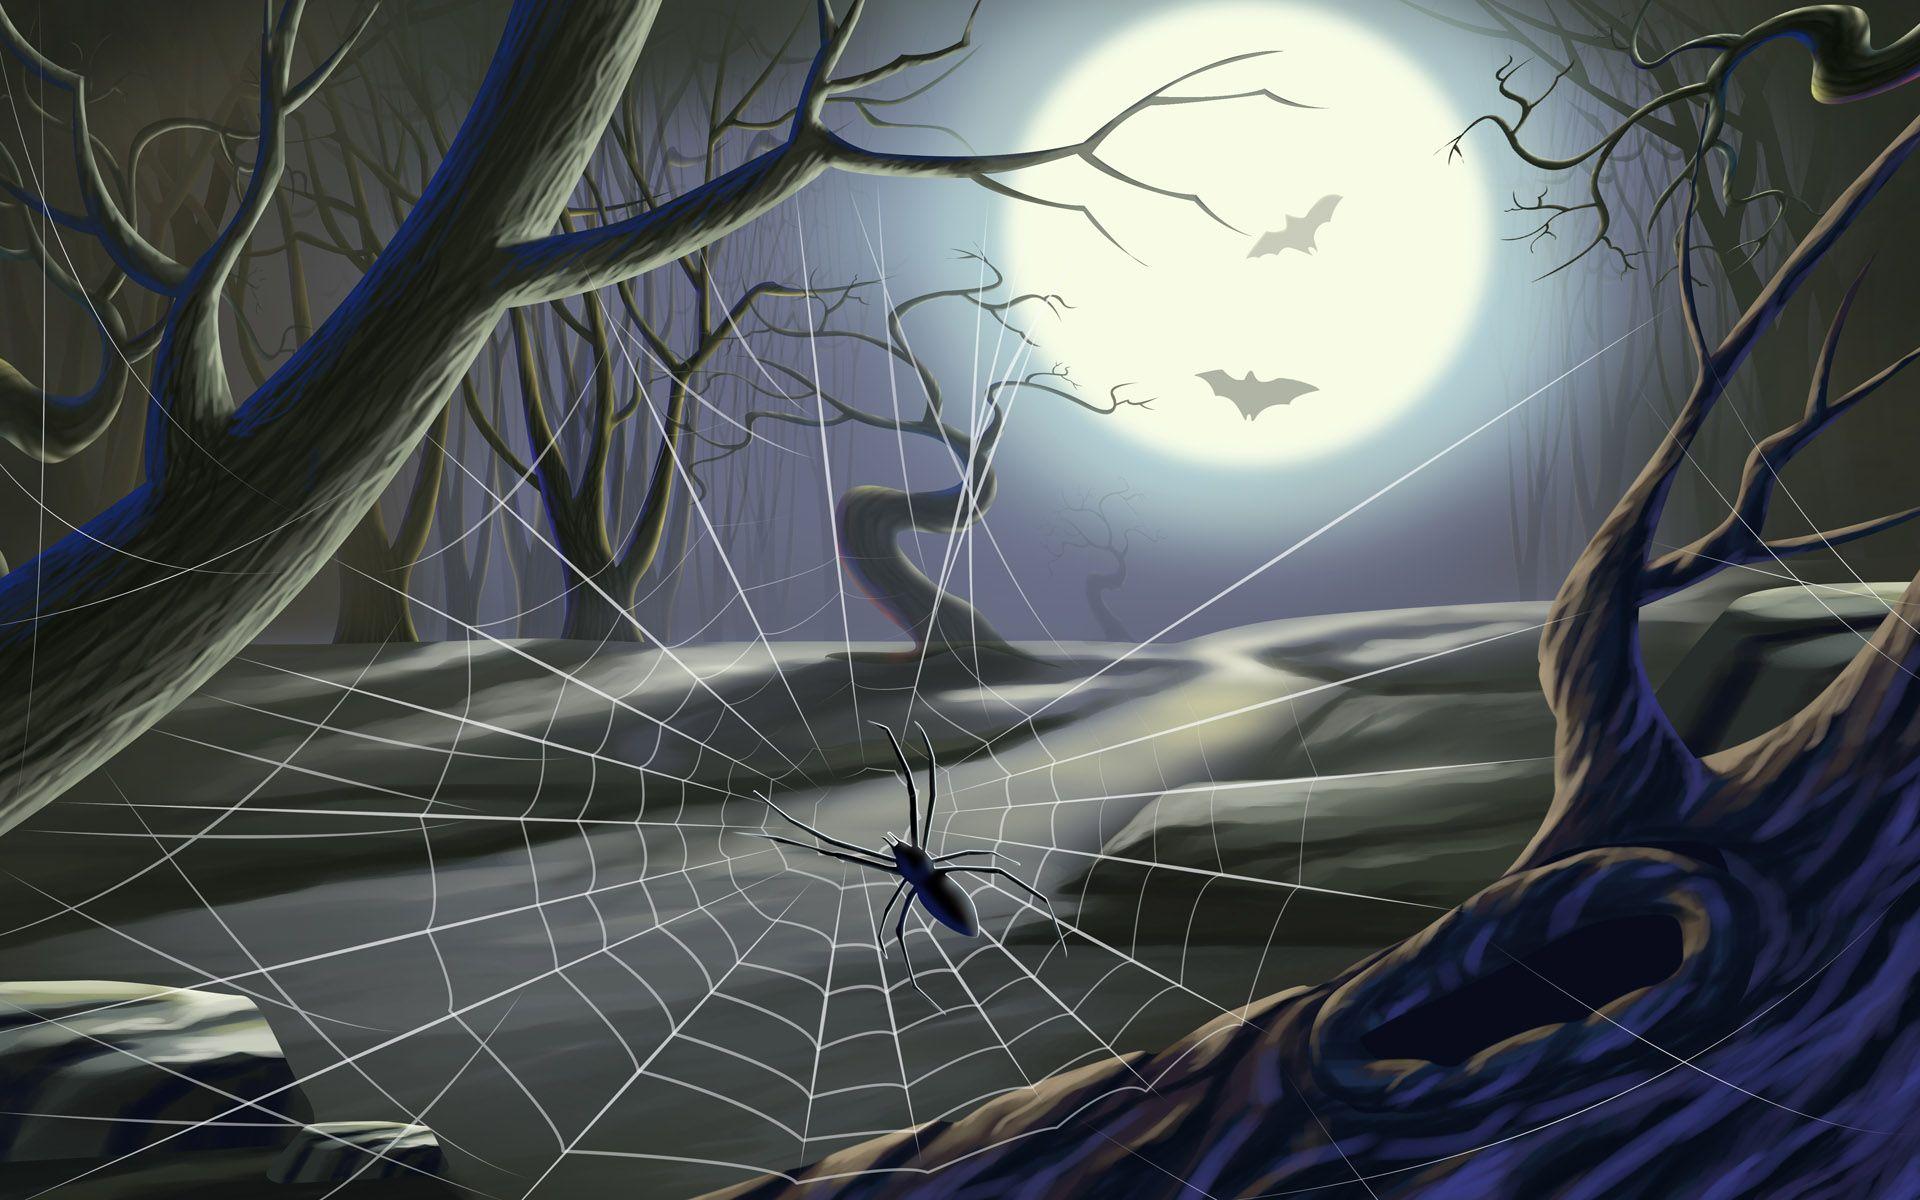 Beautiful Wallpaper Halloween Spider - 1a85d19f007f9a0e0e72ff6a303872b6  Graphic_355594.jpg